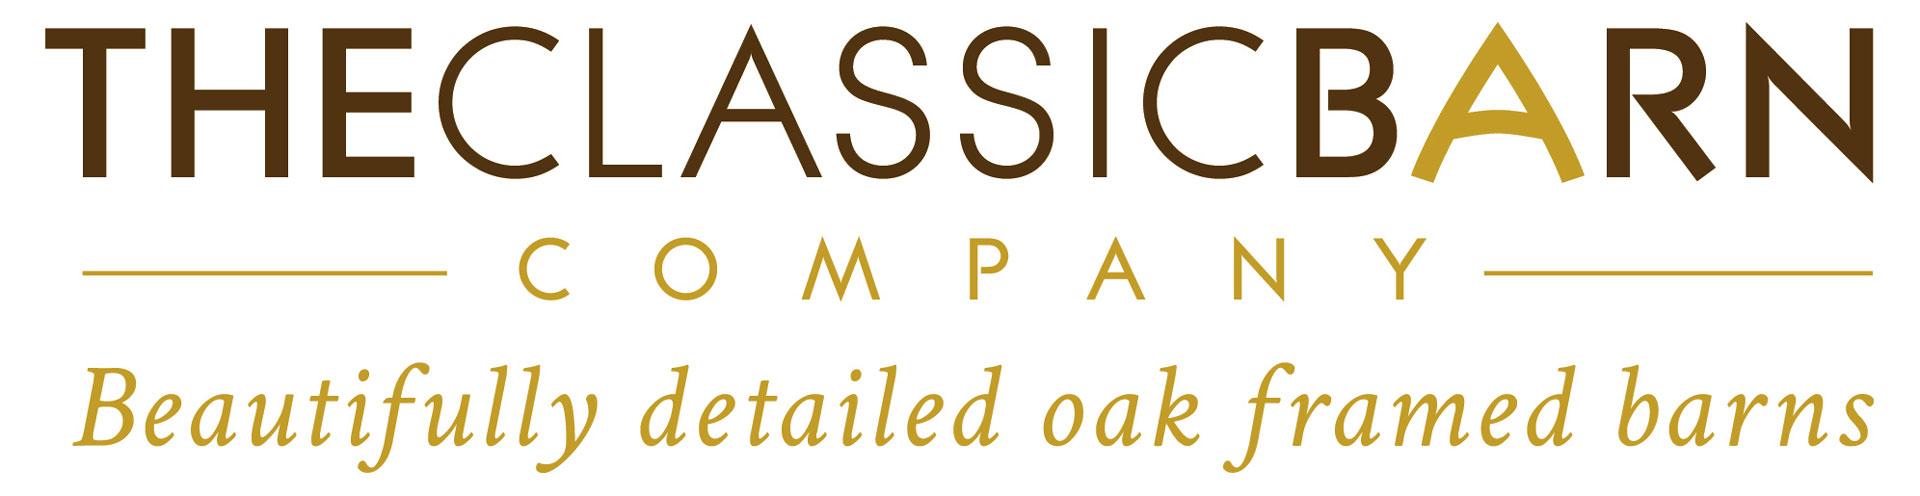 The-Classic-Barn-Company-Logojpg